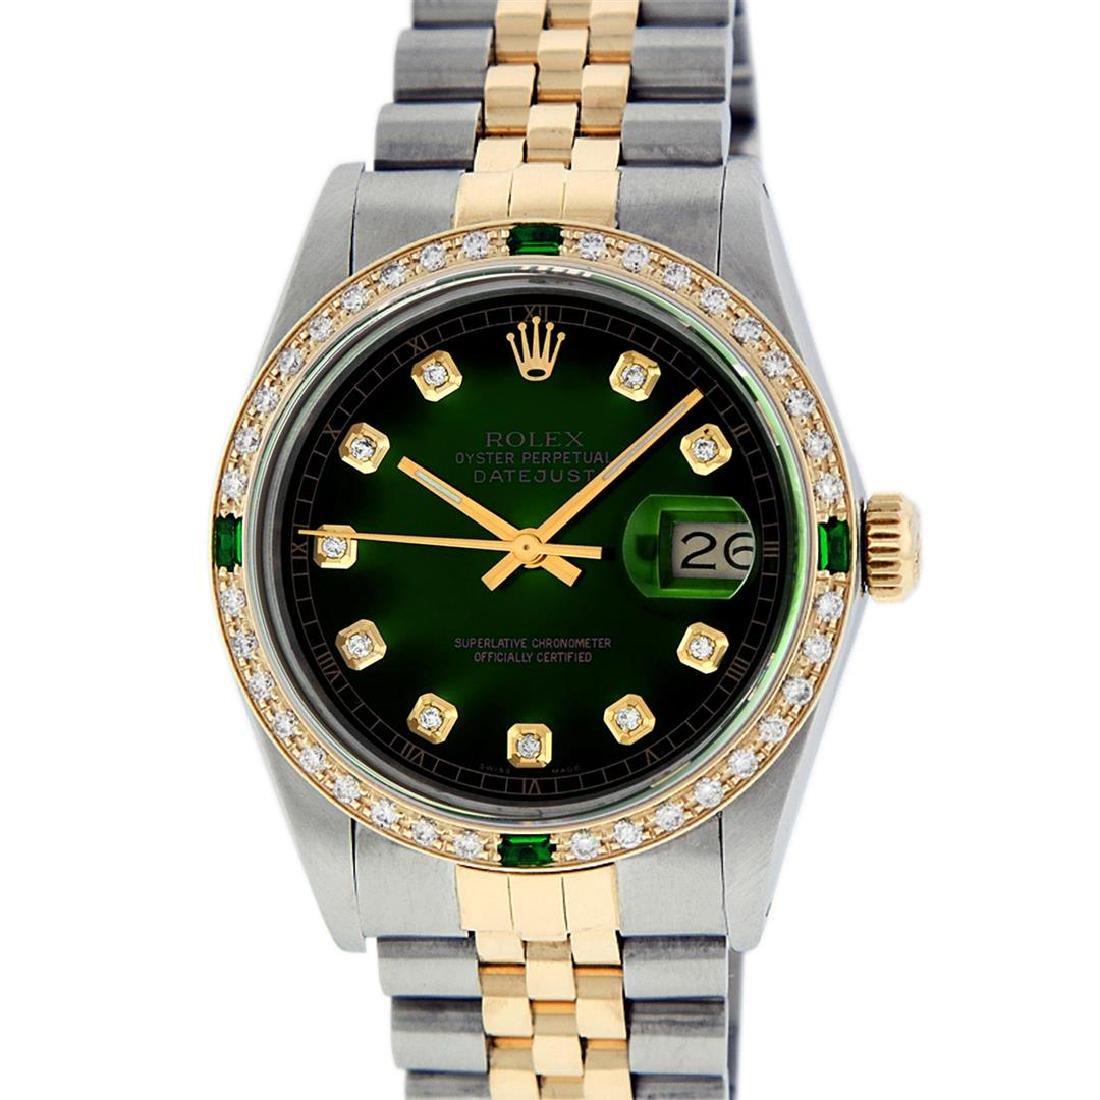 Rolex Men's Two Tone 14K Green Vignette Diamond &